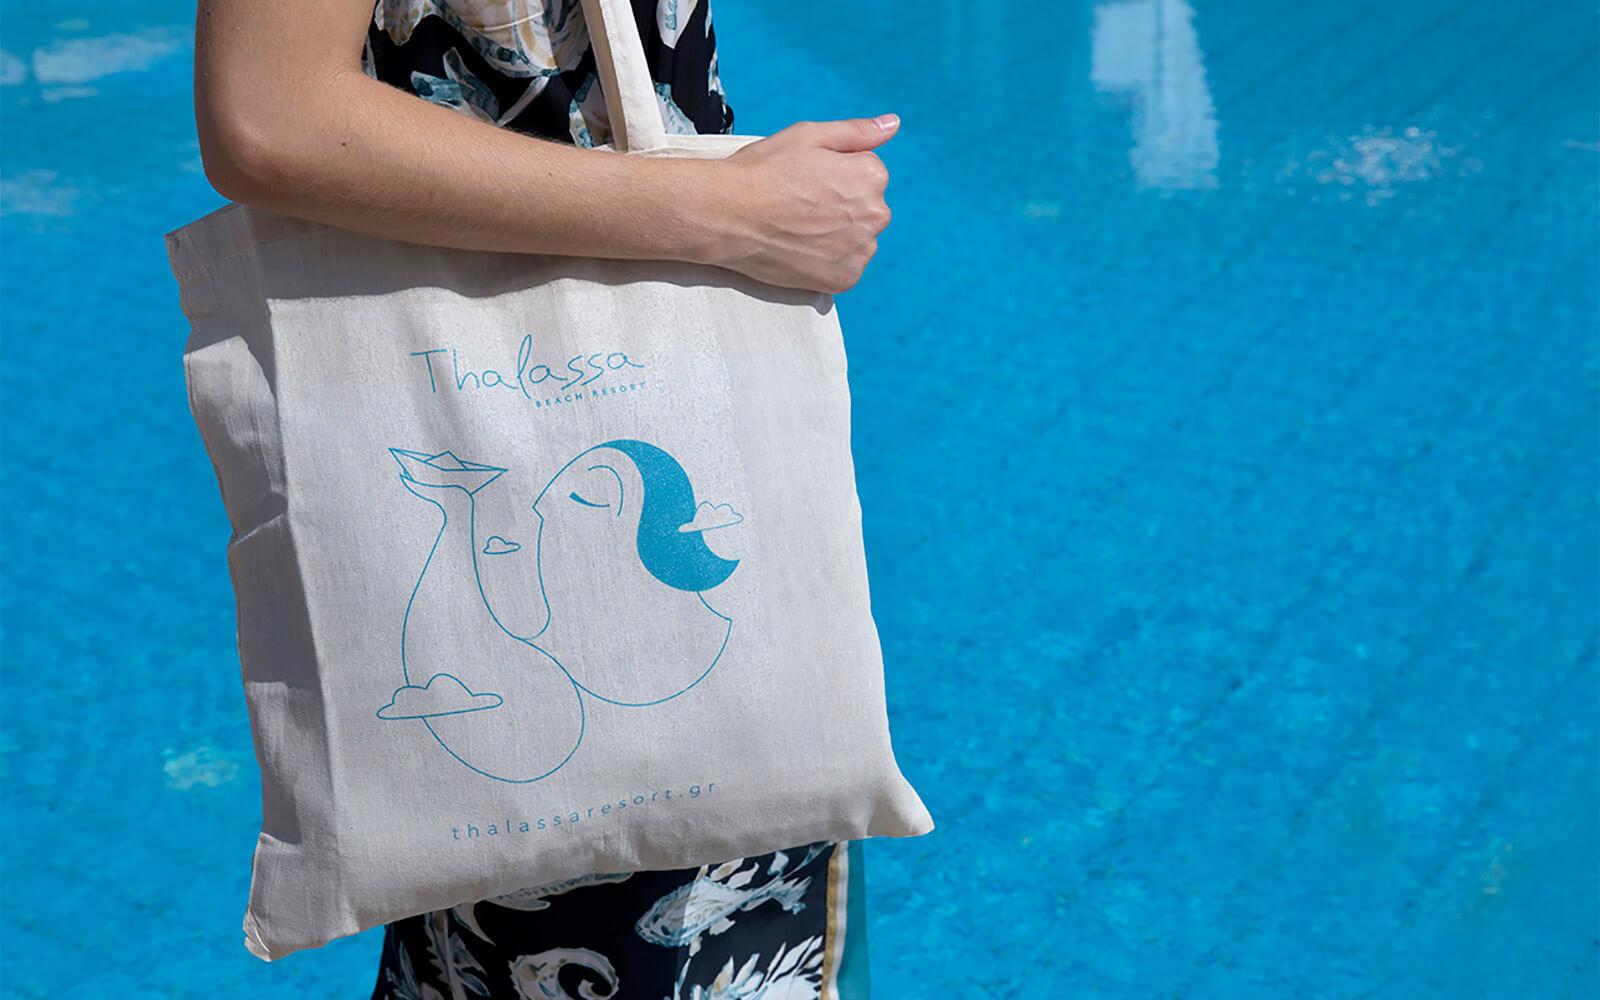 Woman holding bag with thalassa brand